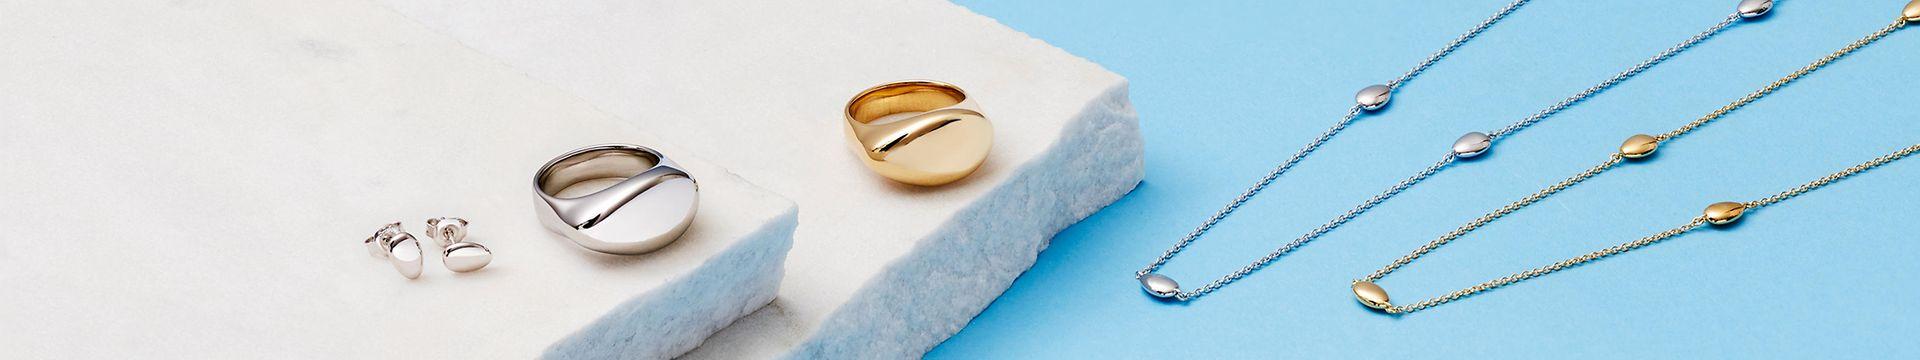 152021 - Women - Accessories - Fashion jewellery - Silver - TC - IMGbanner